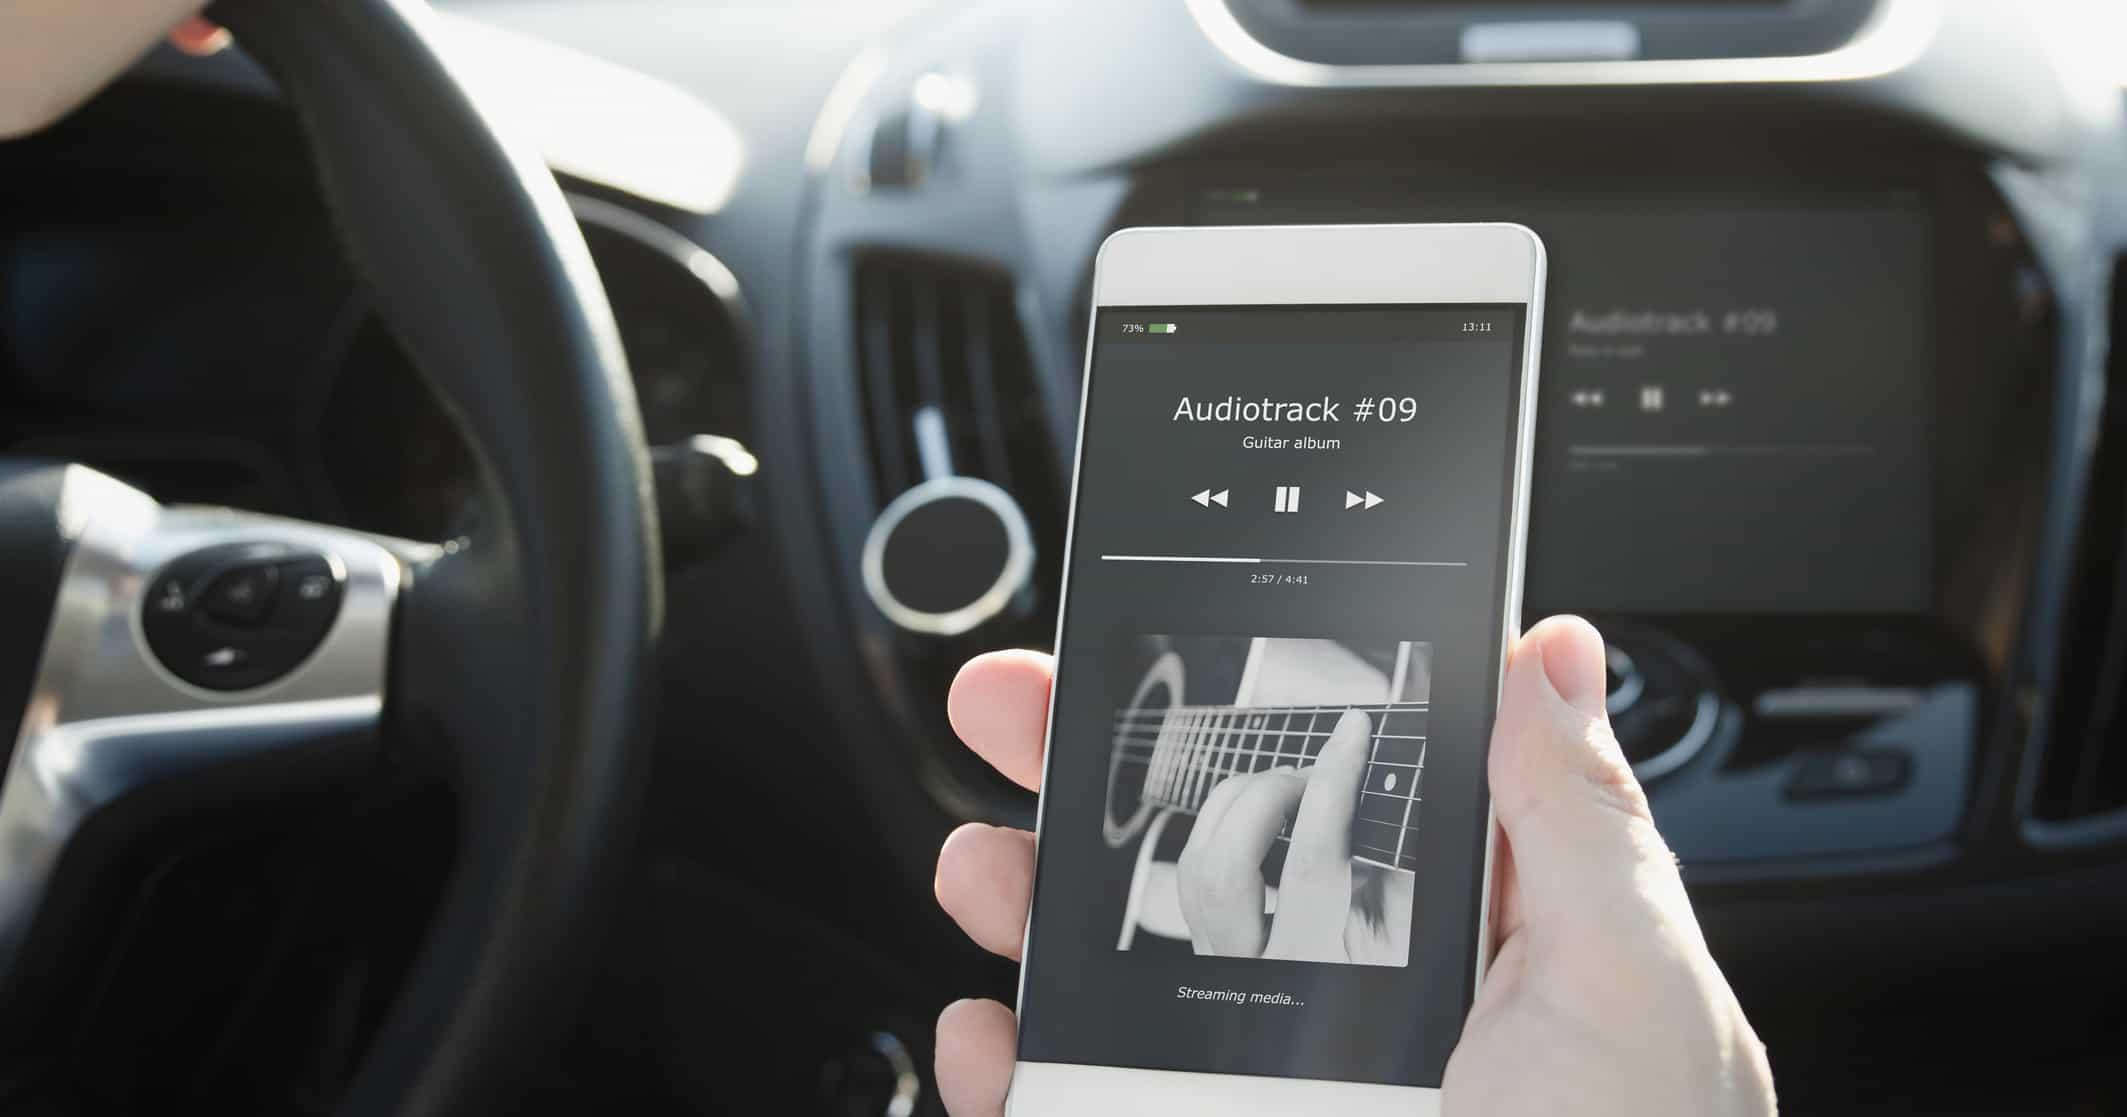 Parceria entre Spotify e Oracle no mercado automotivo